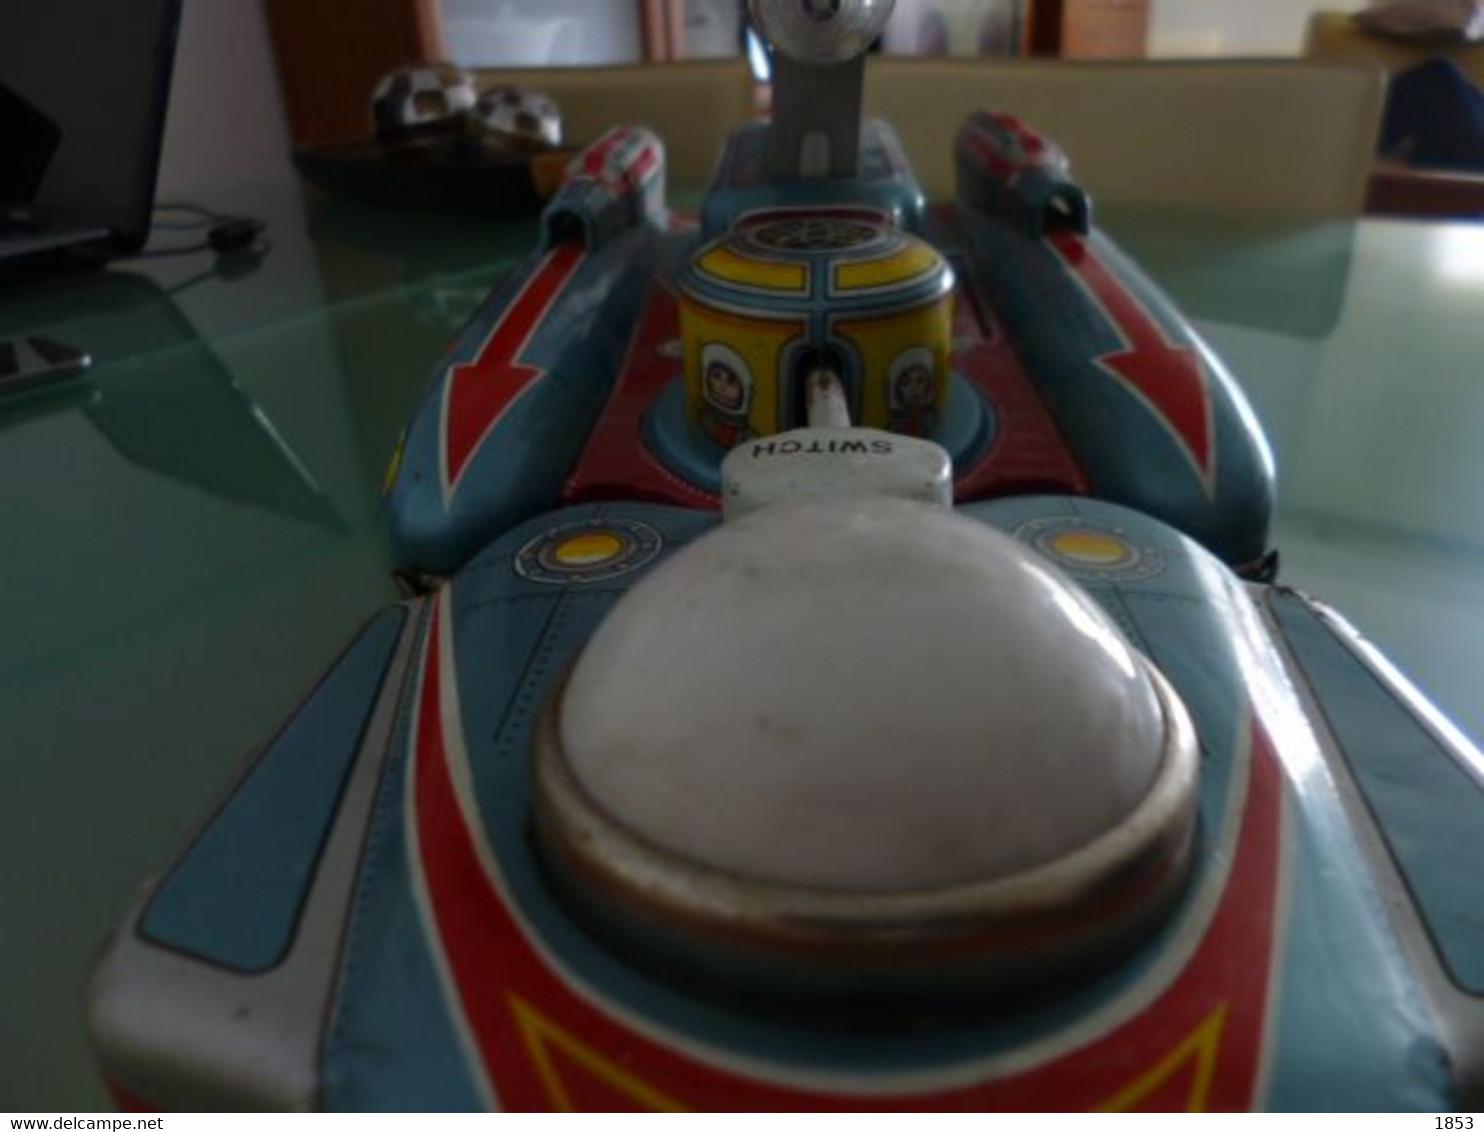 JUGUETES EN LATA - NAVE ESPECIAL- RENDEZVOUS-YANOMAN - MADE IN JAPON- ANOS 50/60 - Toy Memorabilia